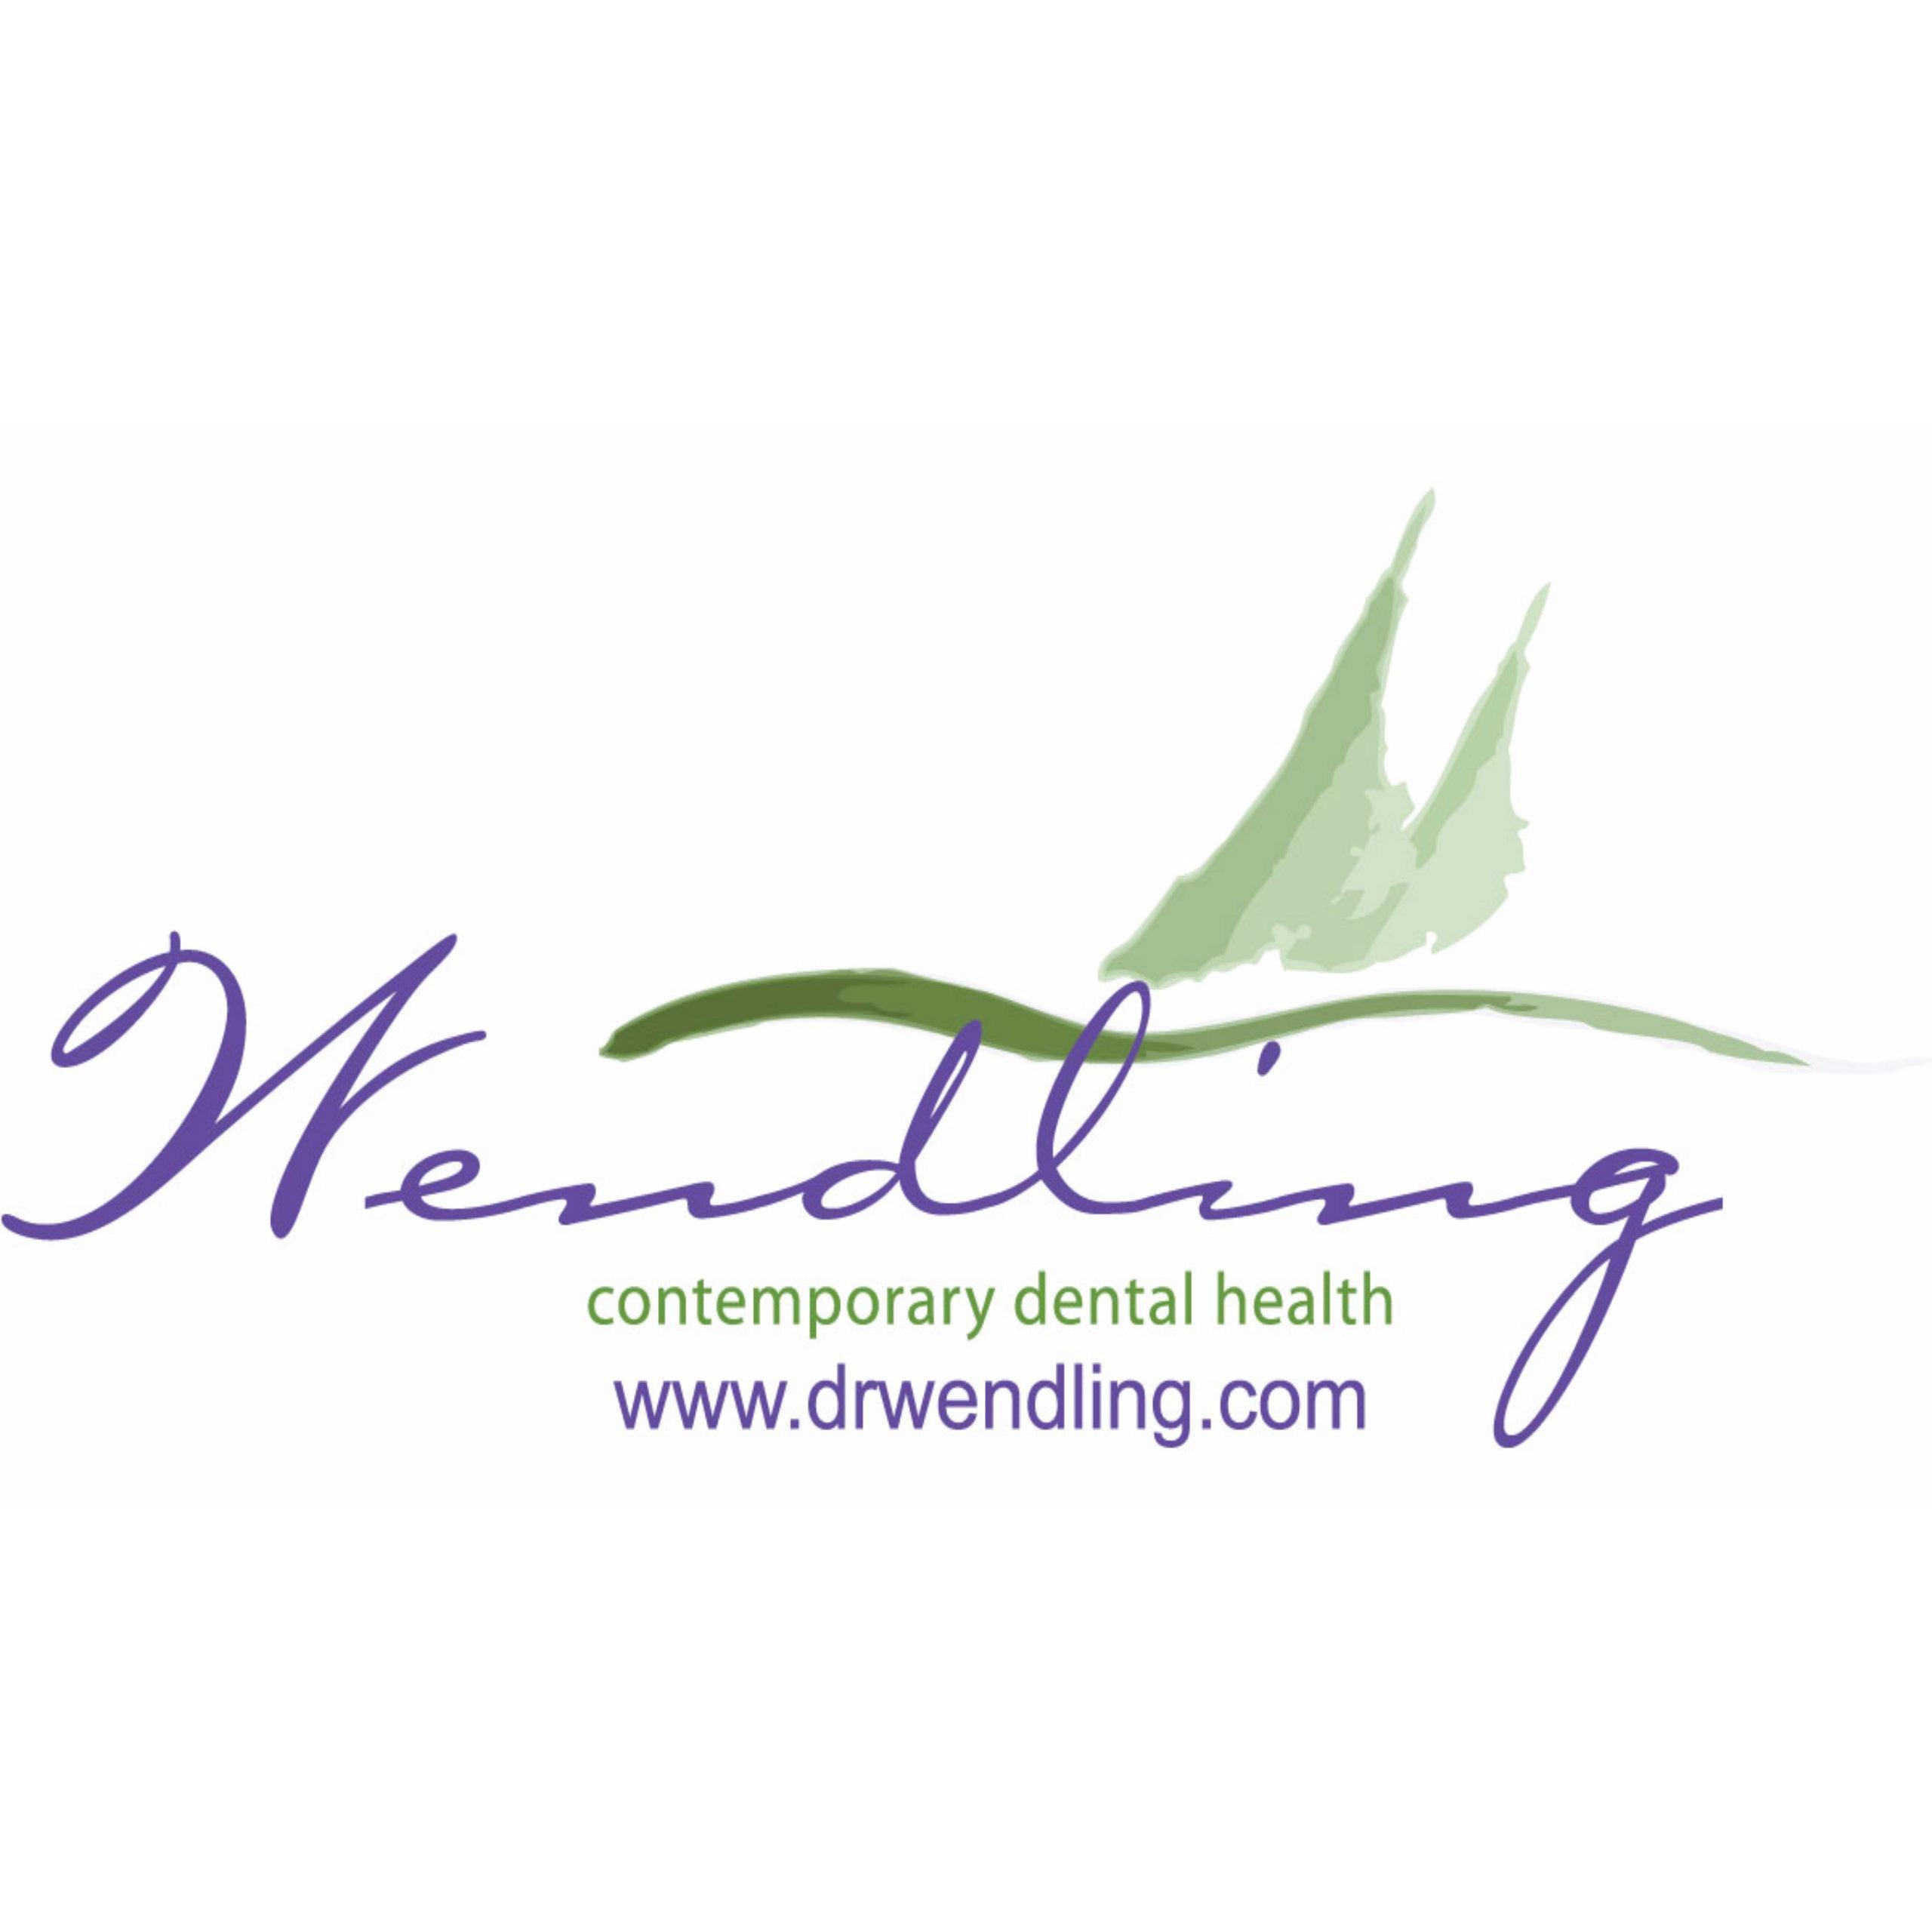 Sue E. Wendling, DMD